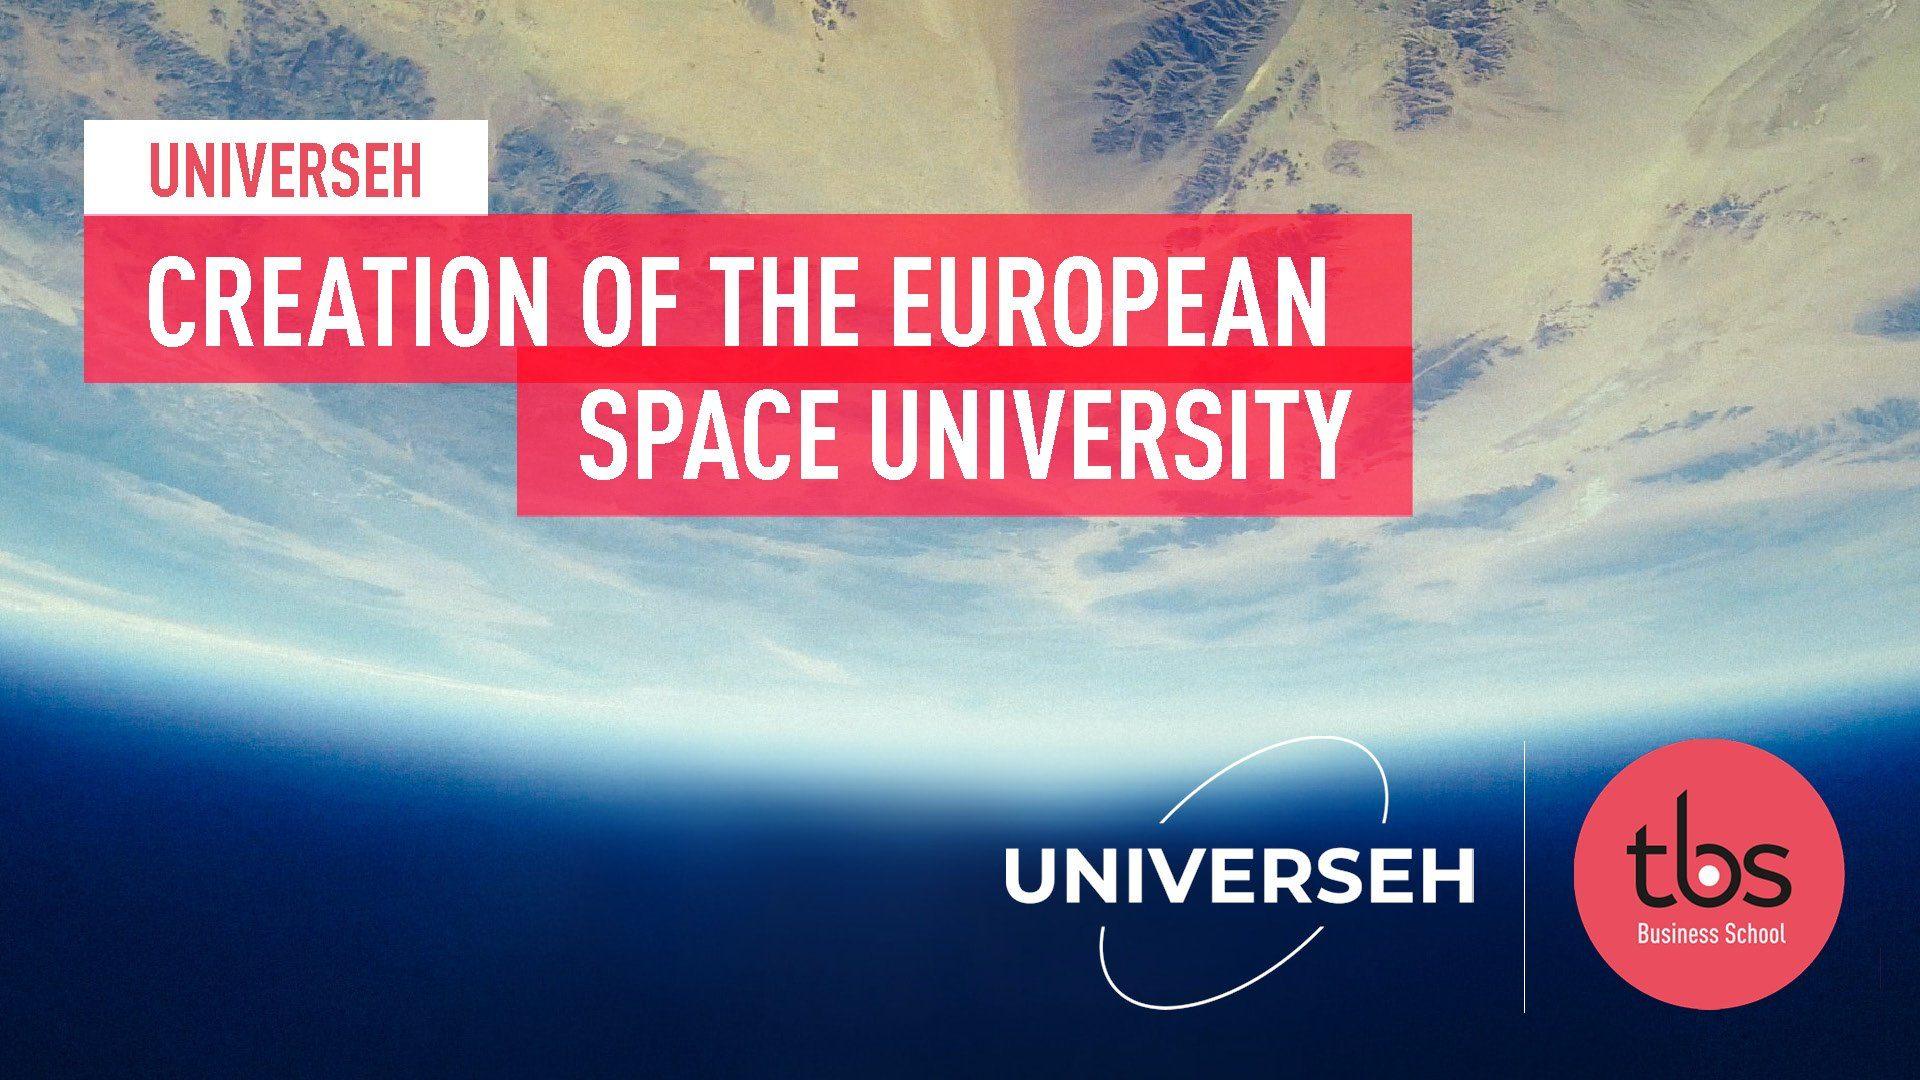 European University Of Space Universeh